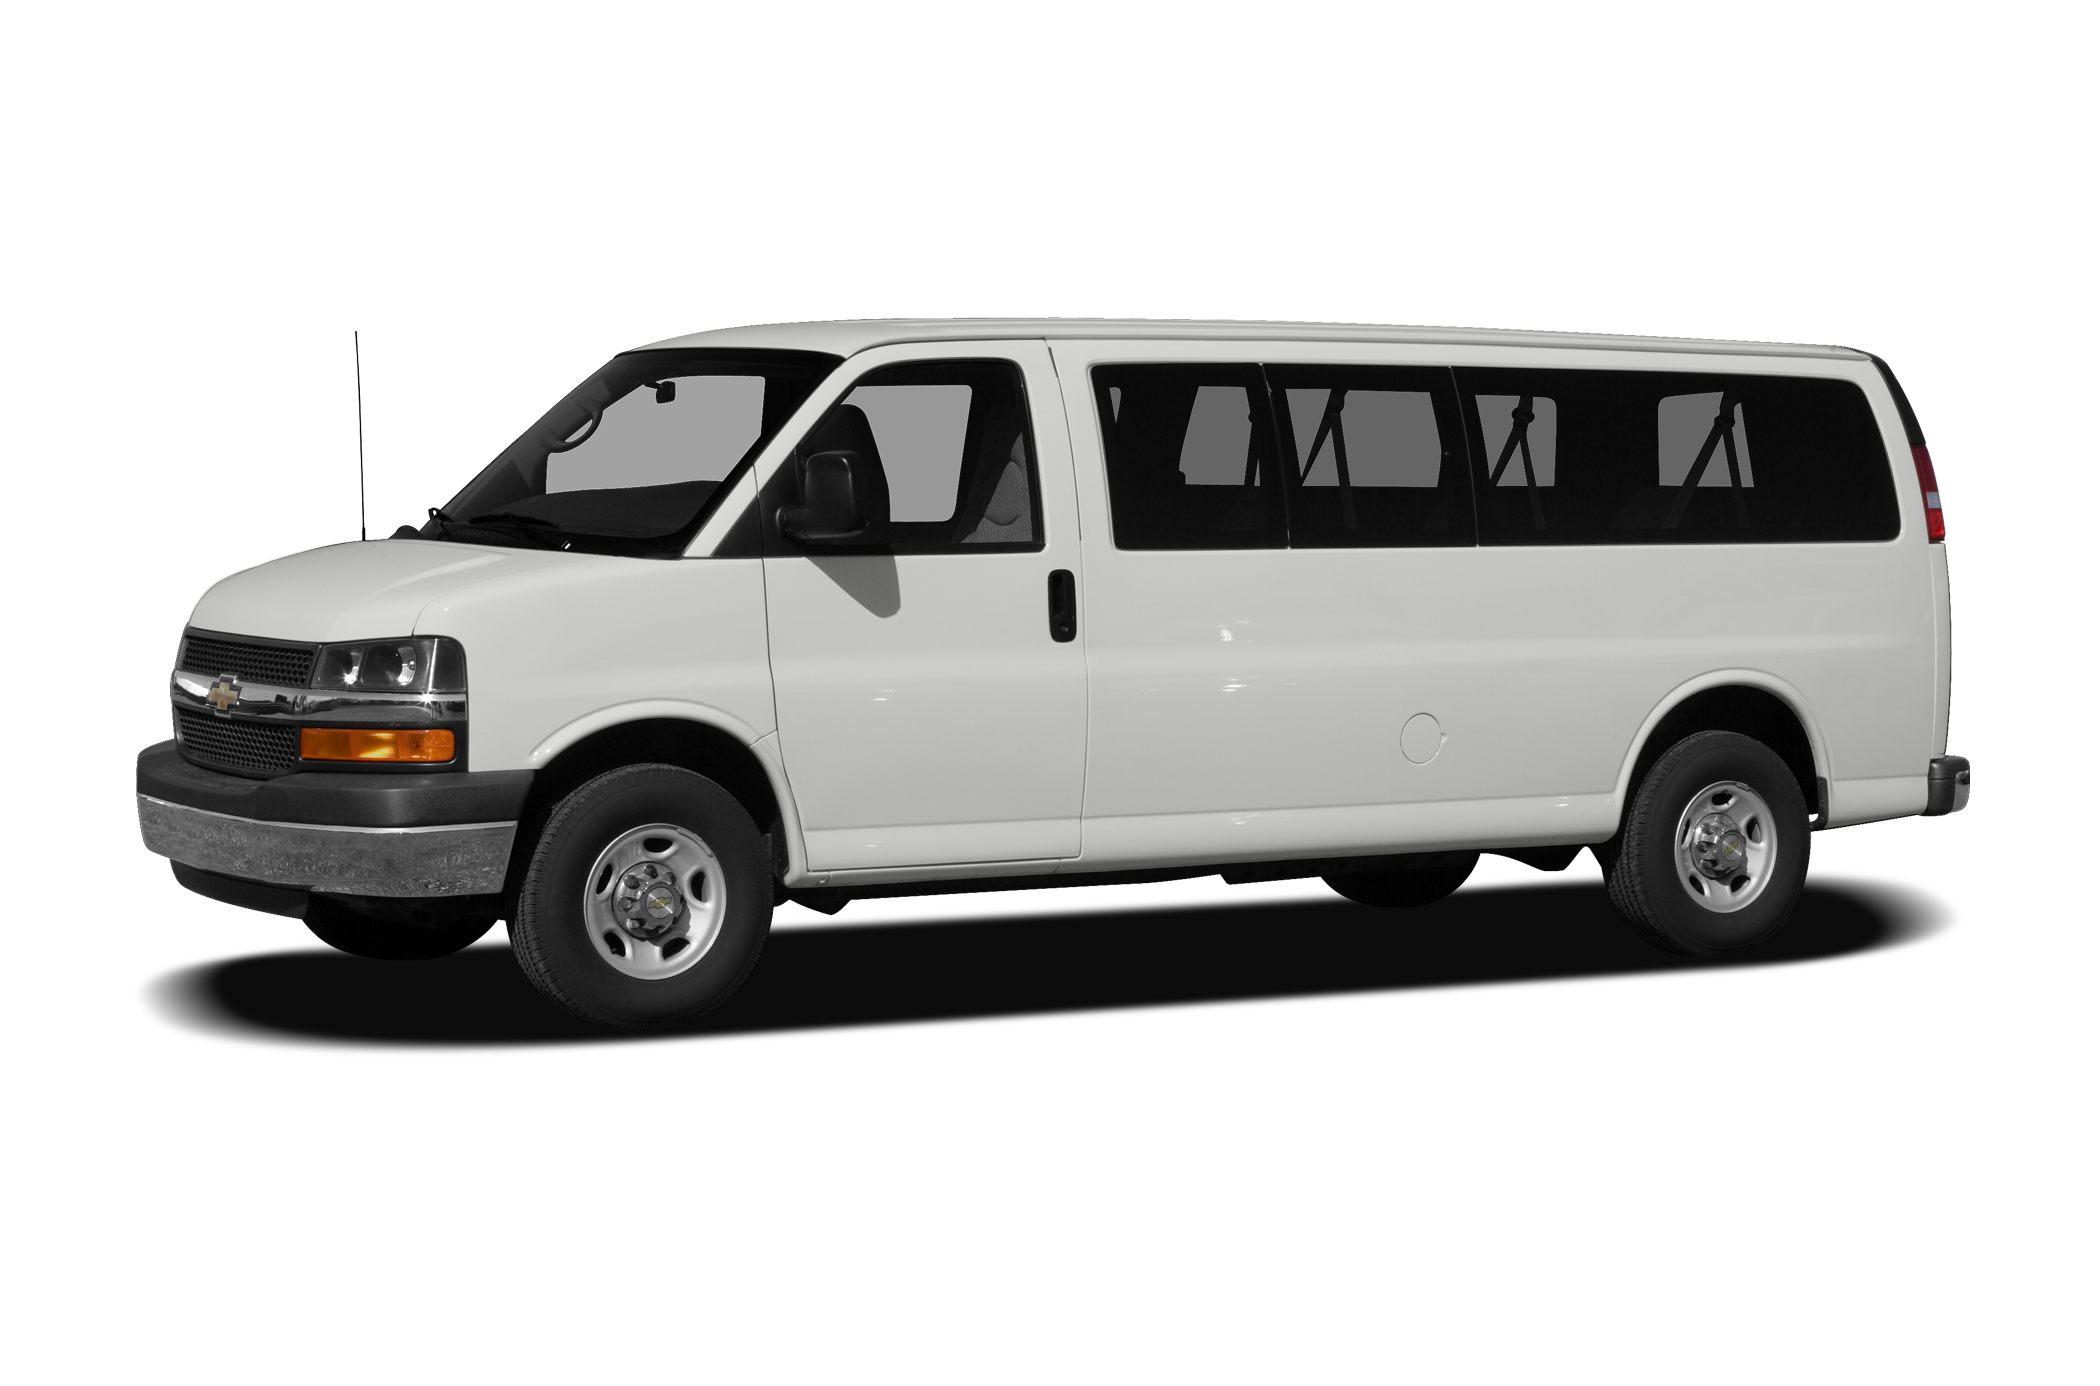 2008 Chevrolet Express Lt Rear Wheel Drive G3500 Extended